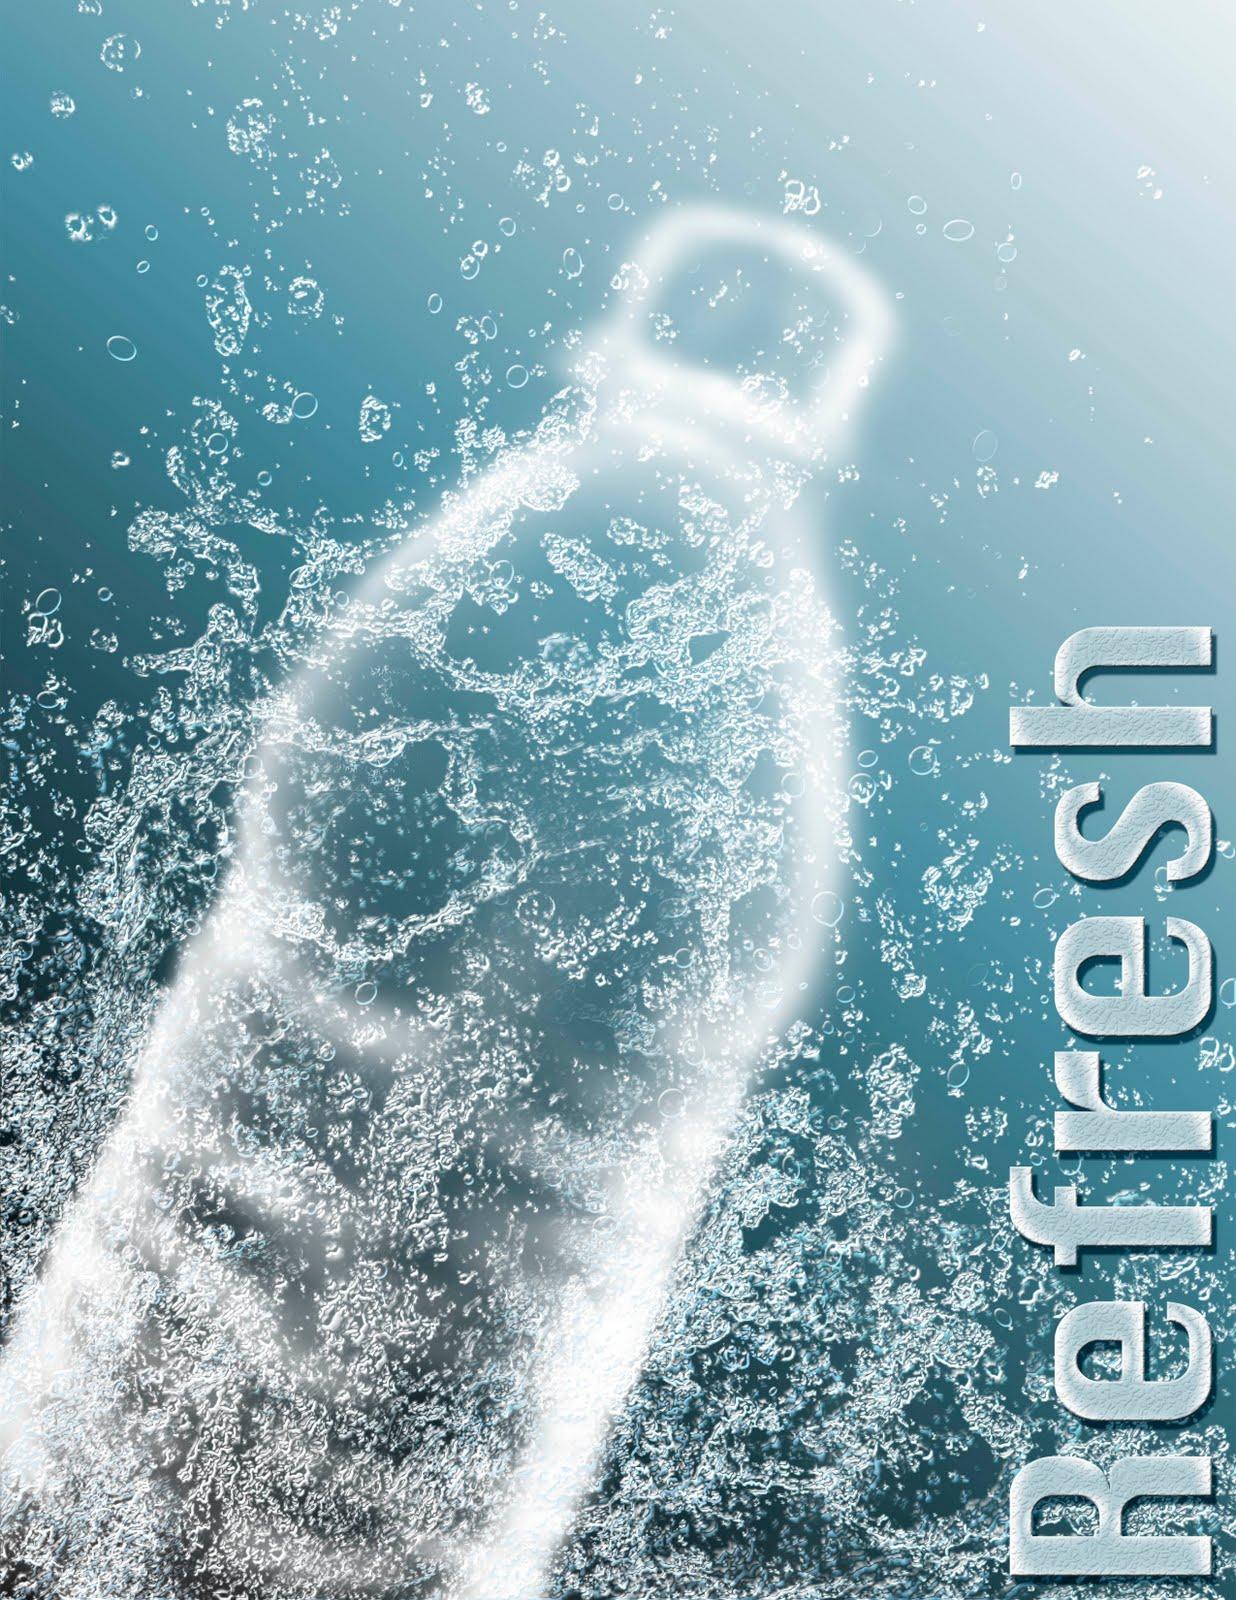 Refreshing Bottled Drinks Refreshing Drink of Water